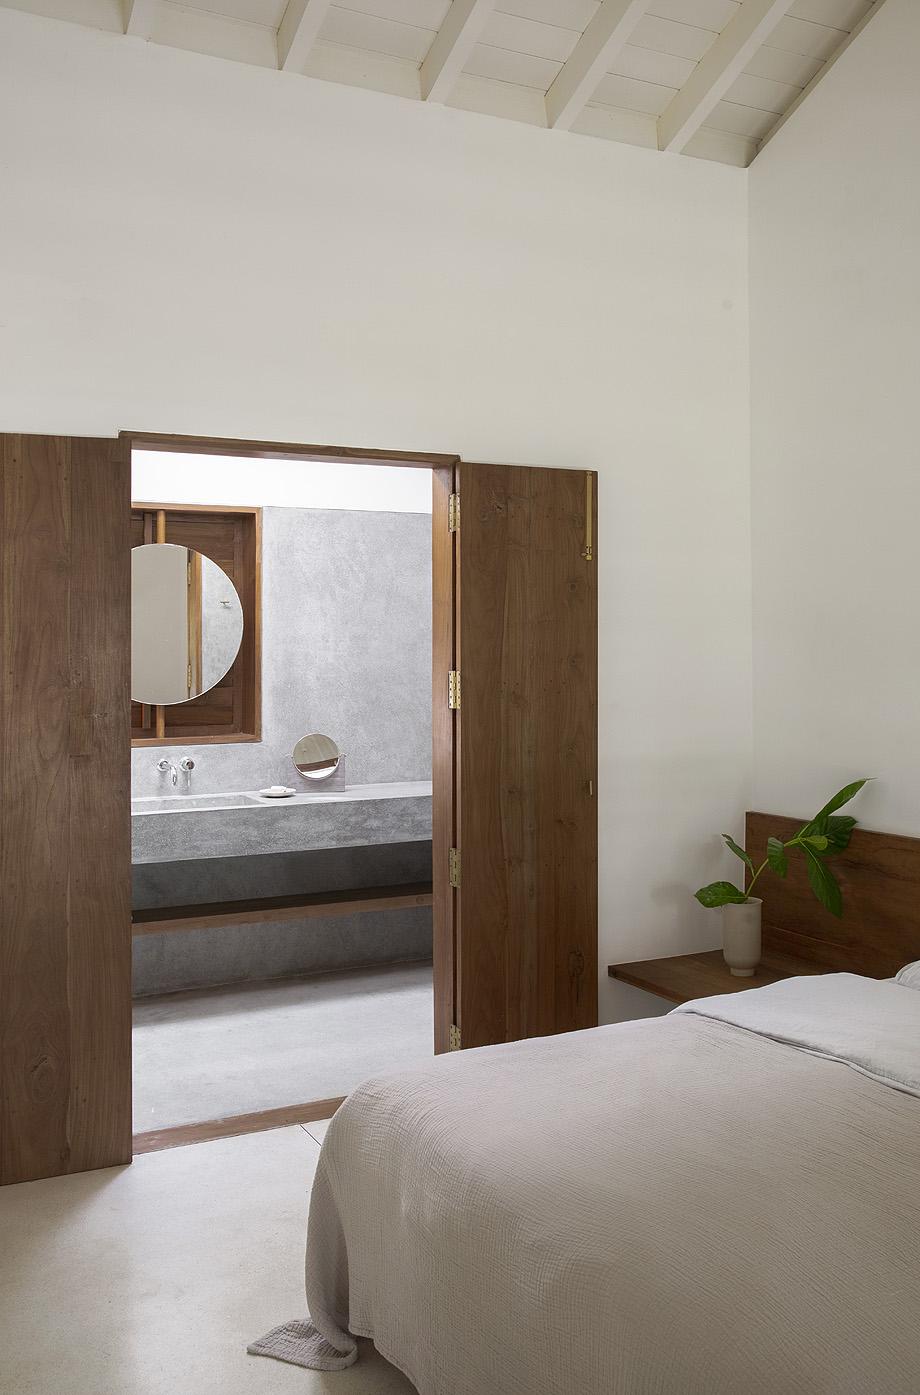 casa k de aim architecture y norm architects - foto jonas bjerre-poulsen y noah sheldon (17) - copia